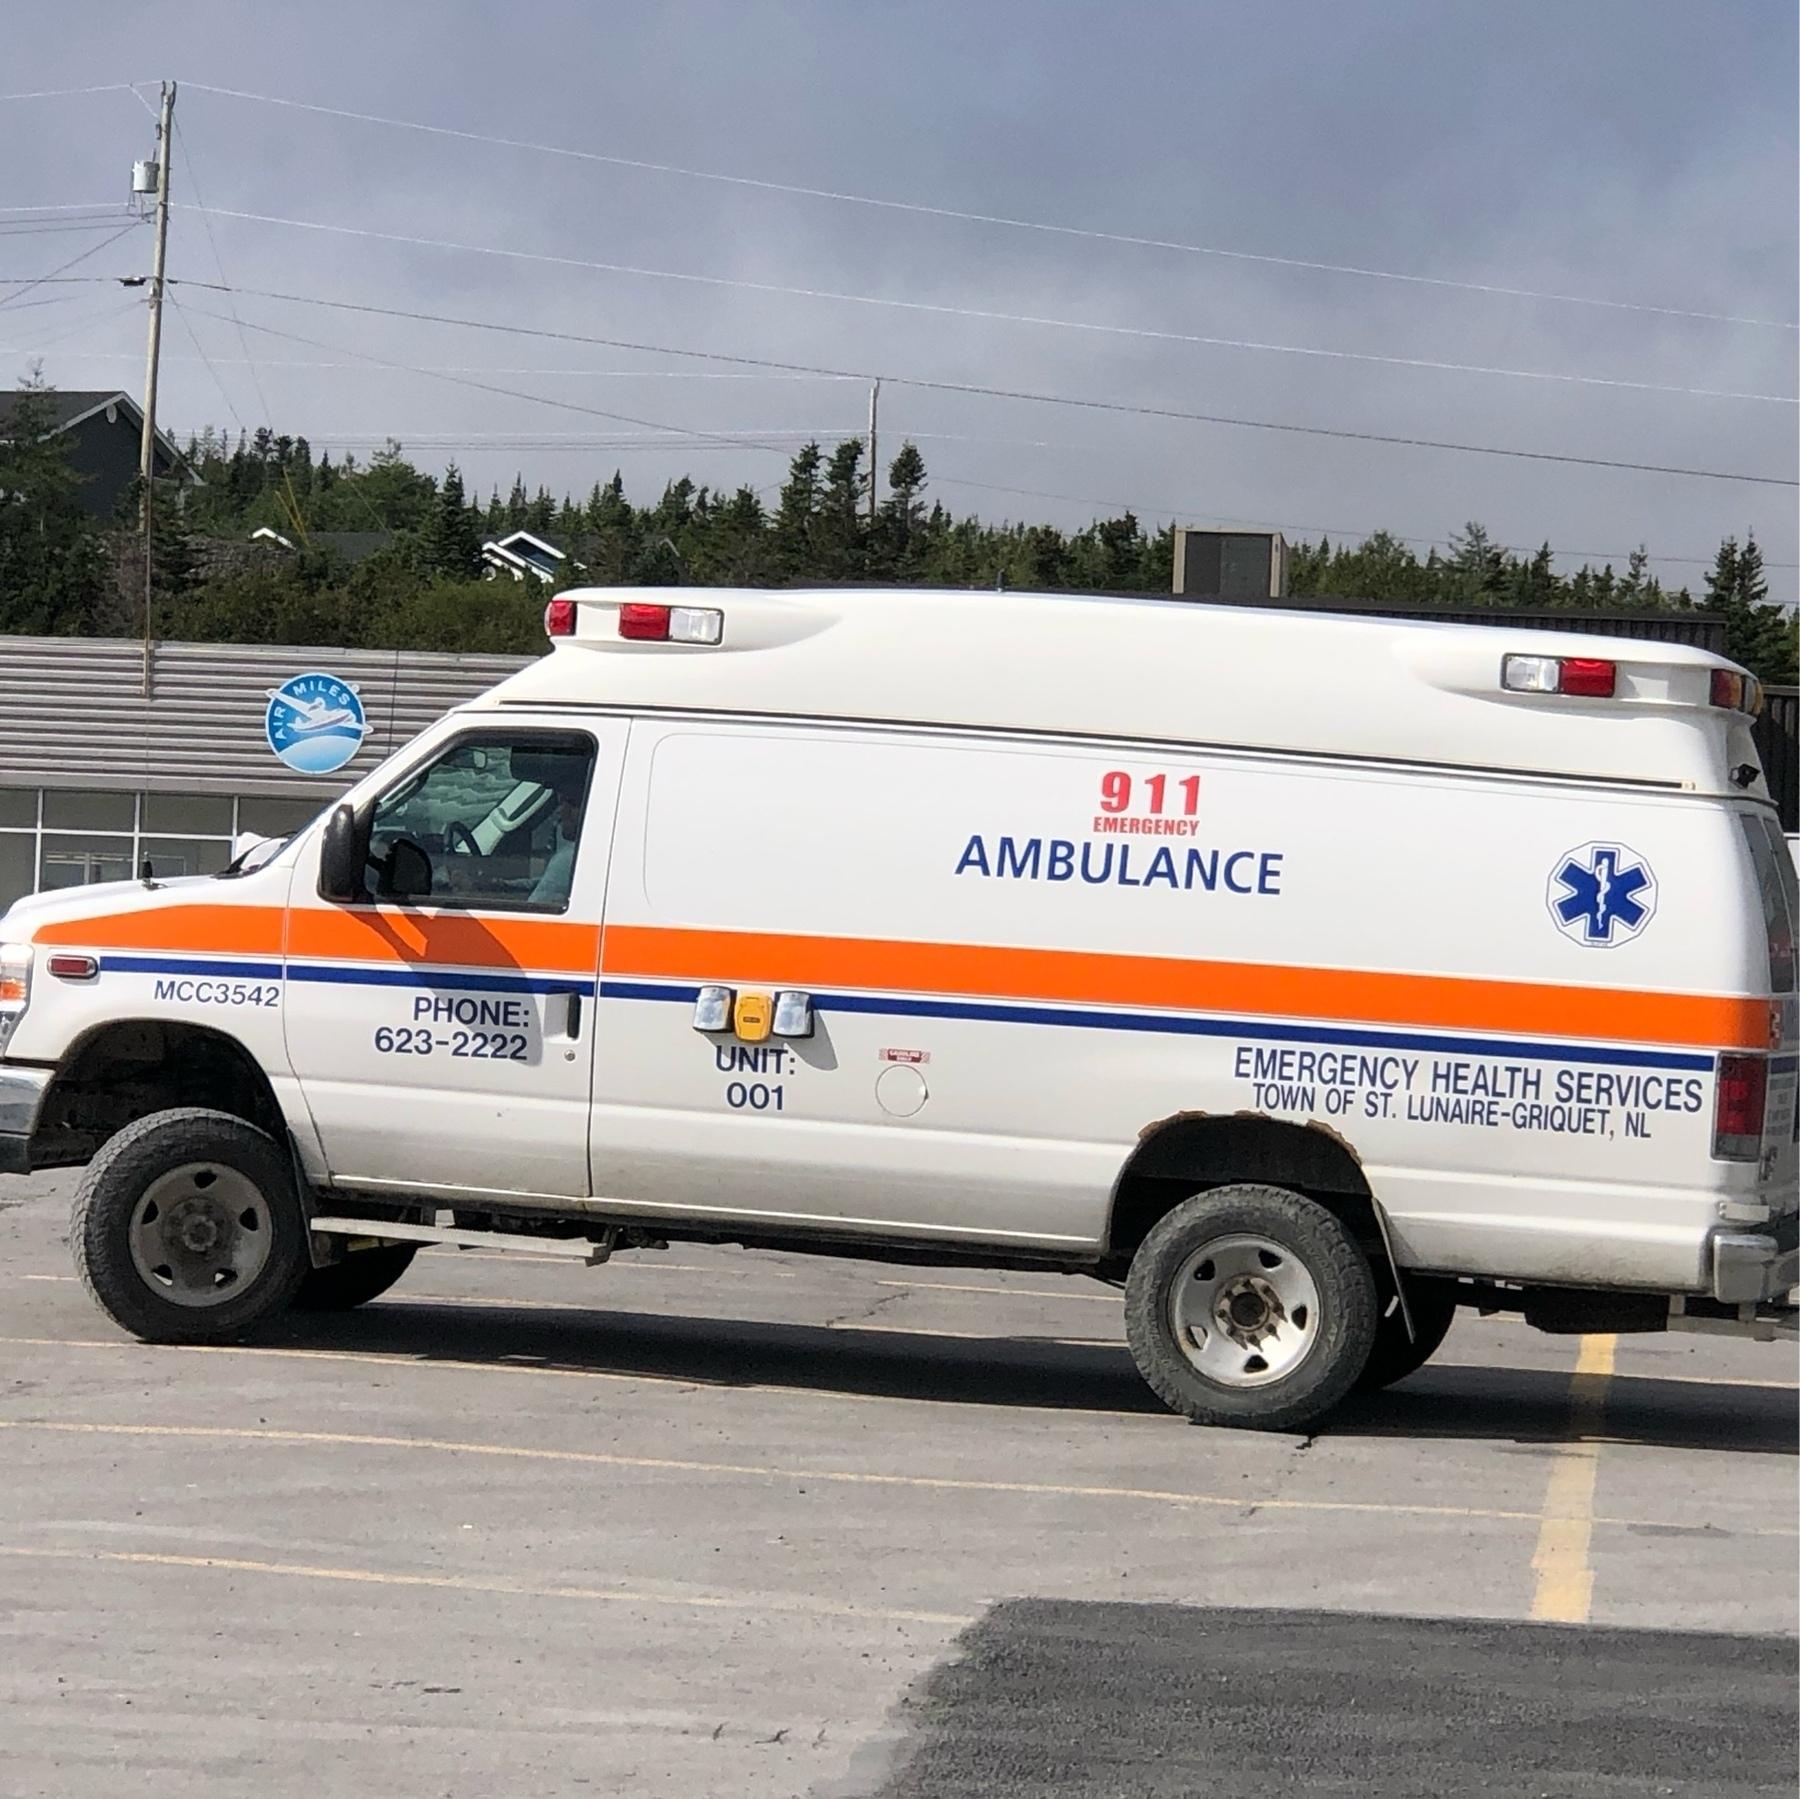 heavy duty van converted into ambulance for town of st. lunaire-griquet nl